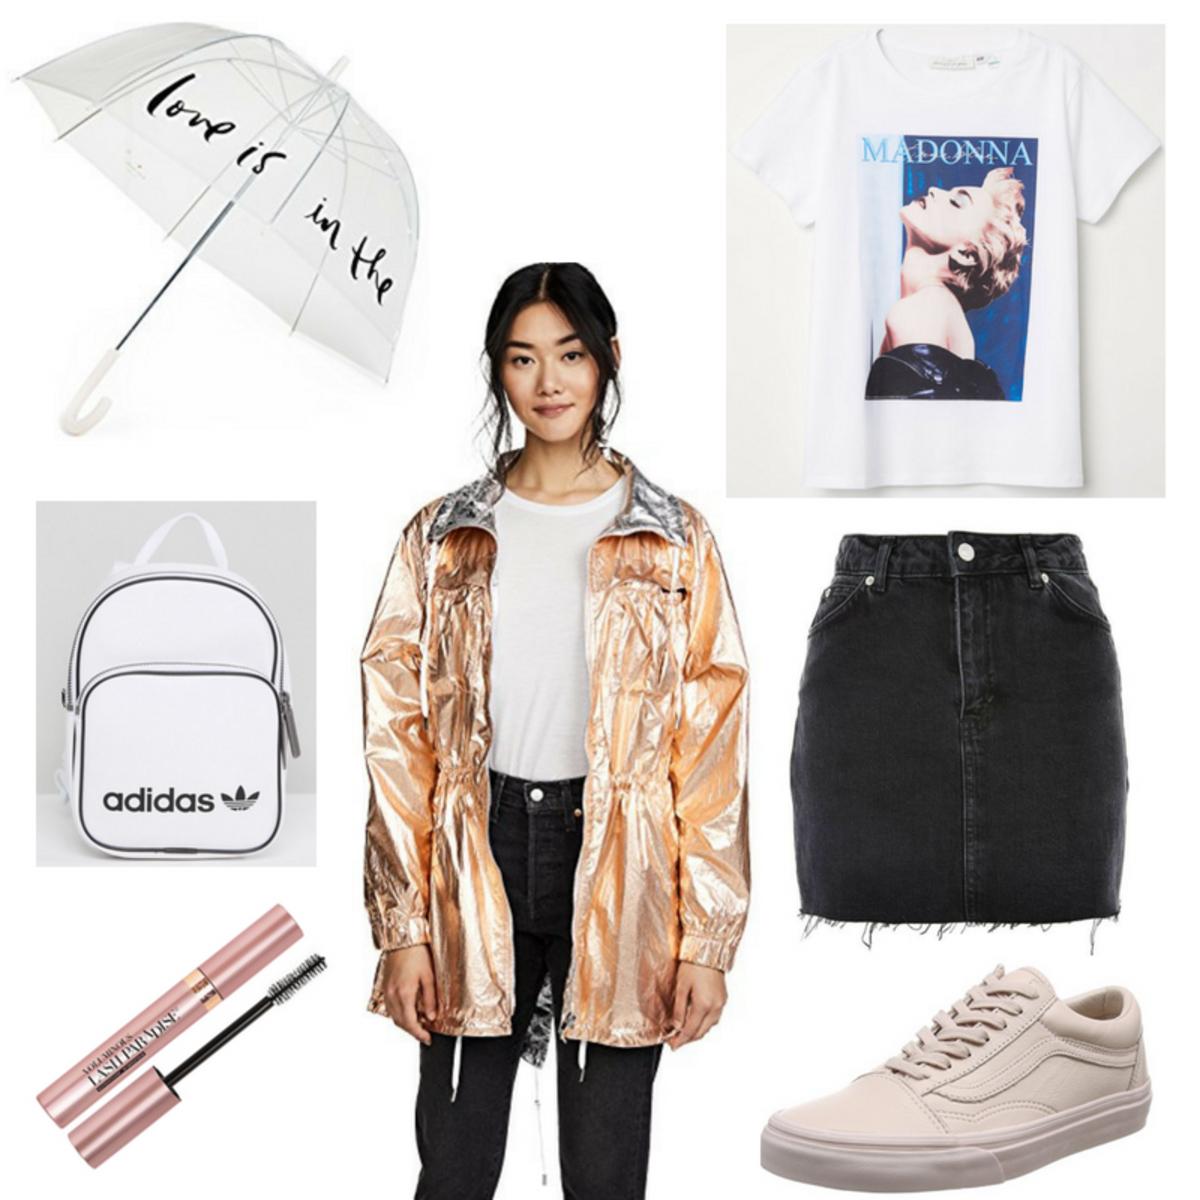 black-mini-skirt-denim-white-shoe-sneakers-white-graphic-tee-gold-yellow-jacket-parka-metallice-white-bag-pack-rain-spring-summer-weekend.jpg